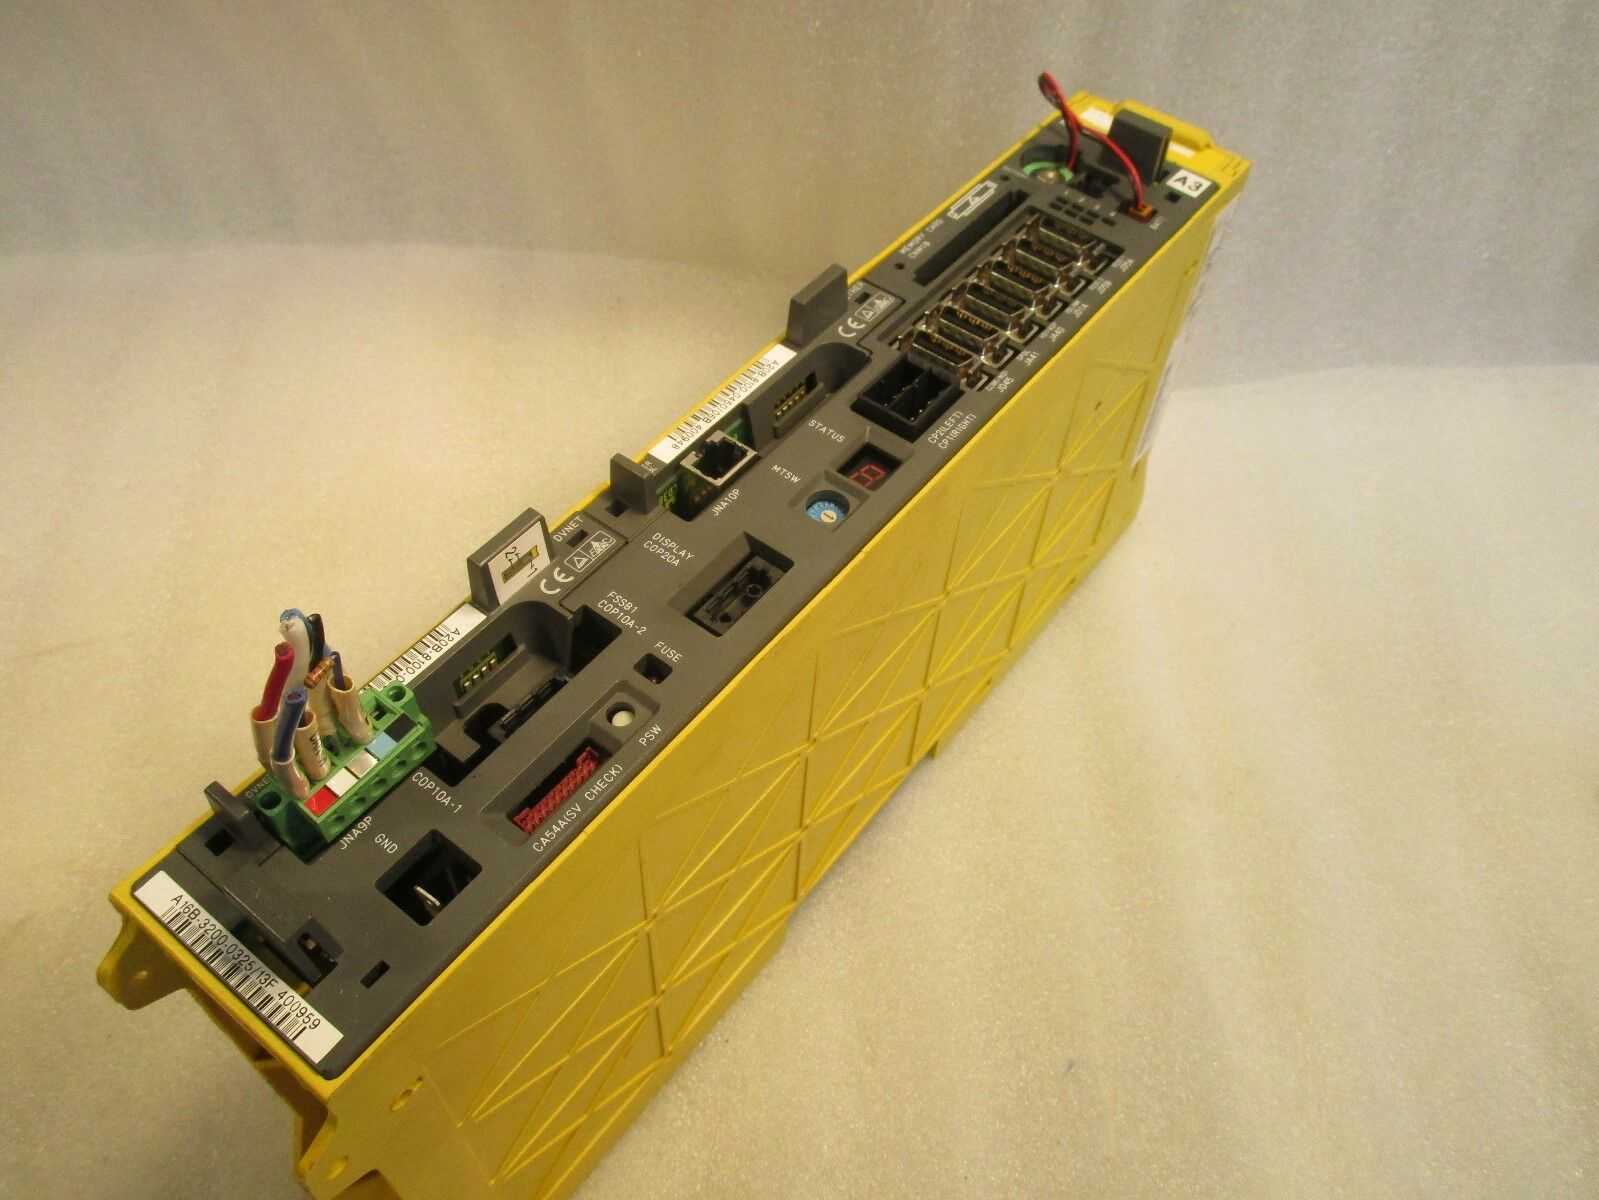 Fanuc 18i CNC Control A02B-0266-B501, A16B-3200-0325